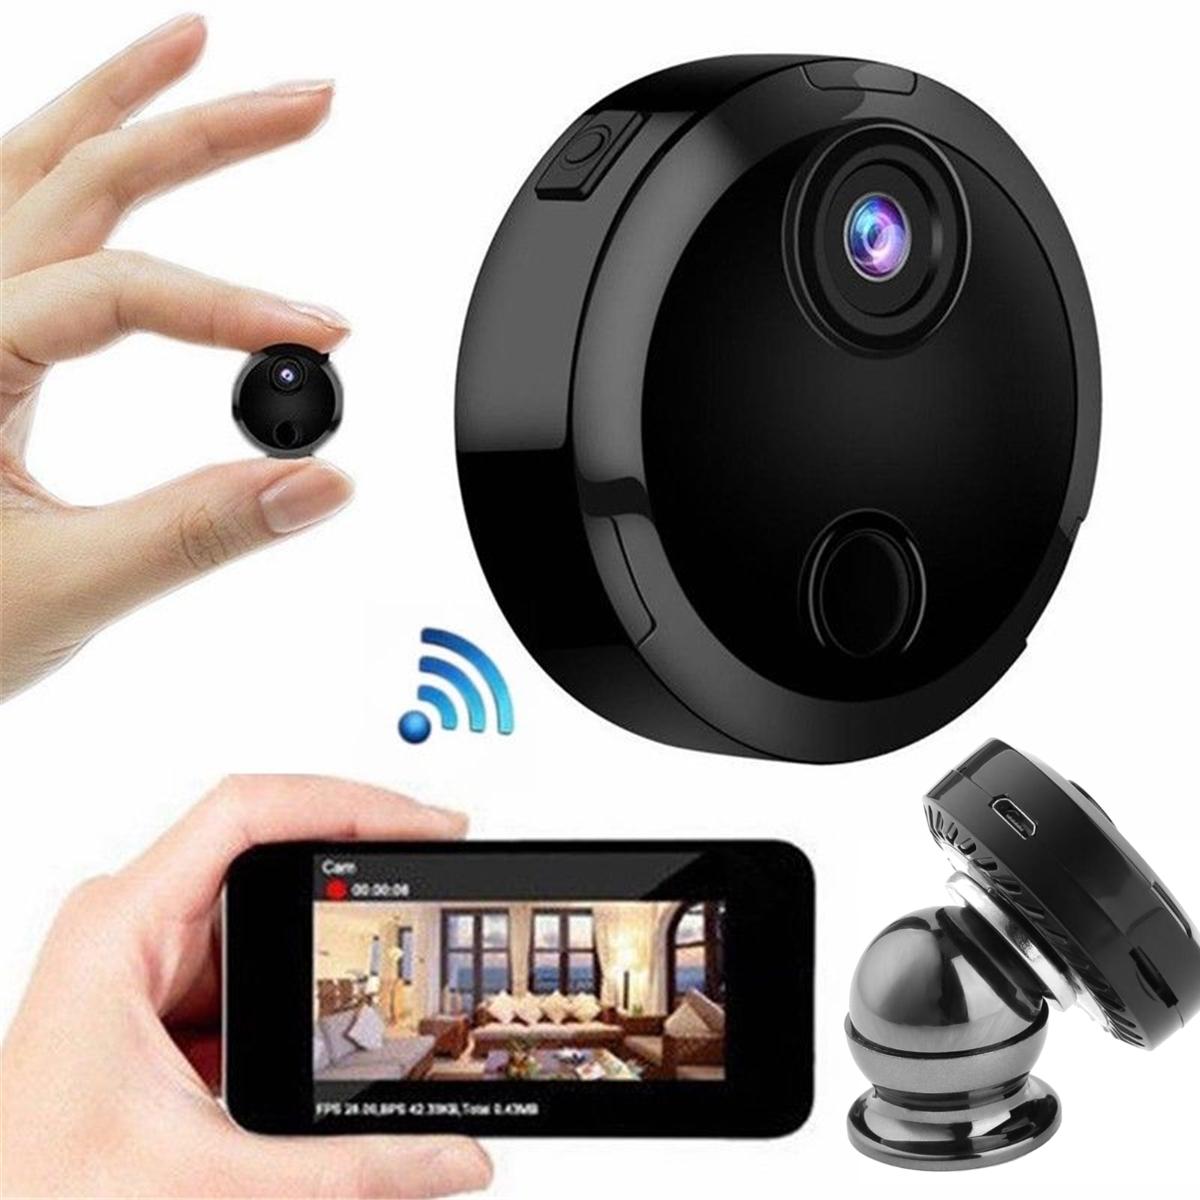 Wireless Security Camera, IP Camera 1080P HD, WiFi Home